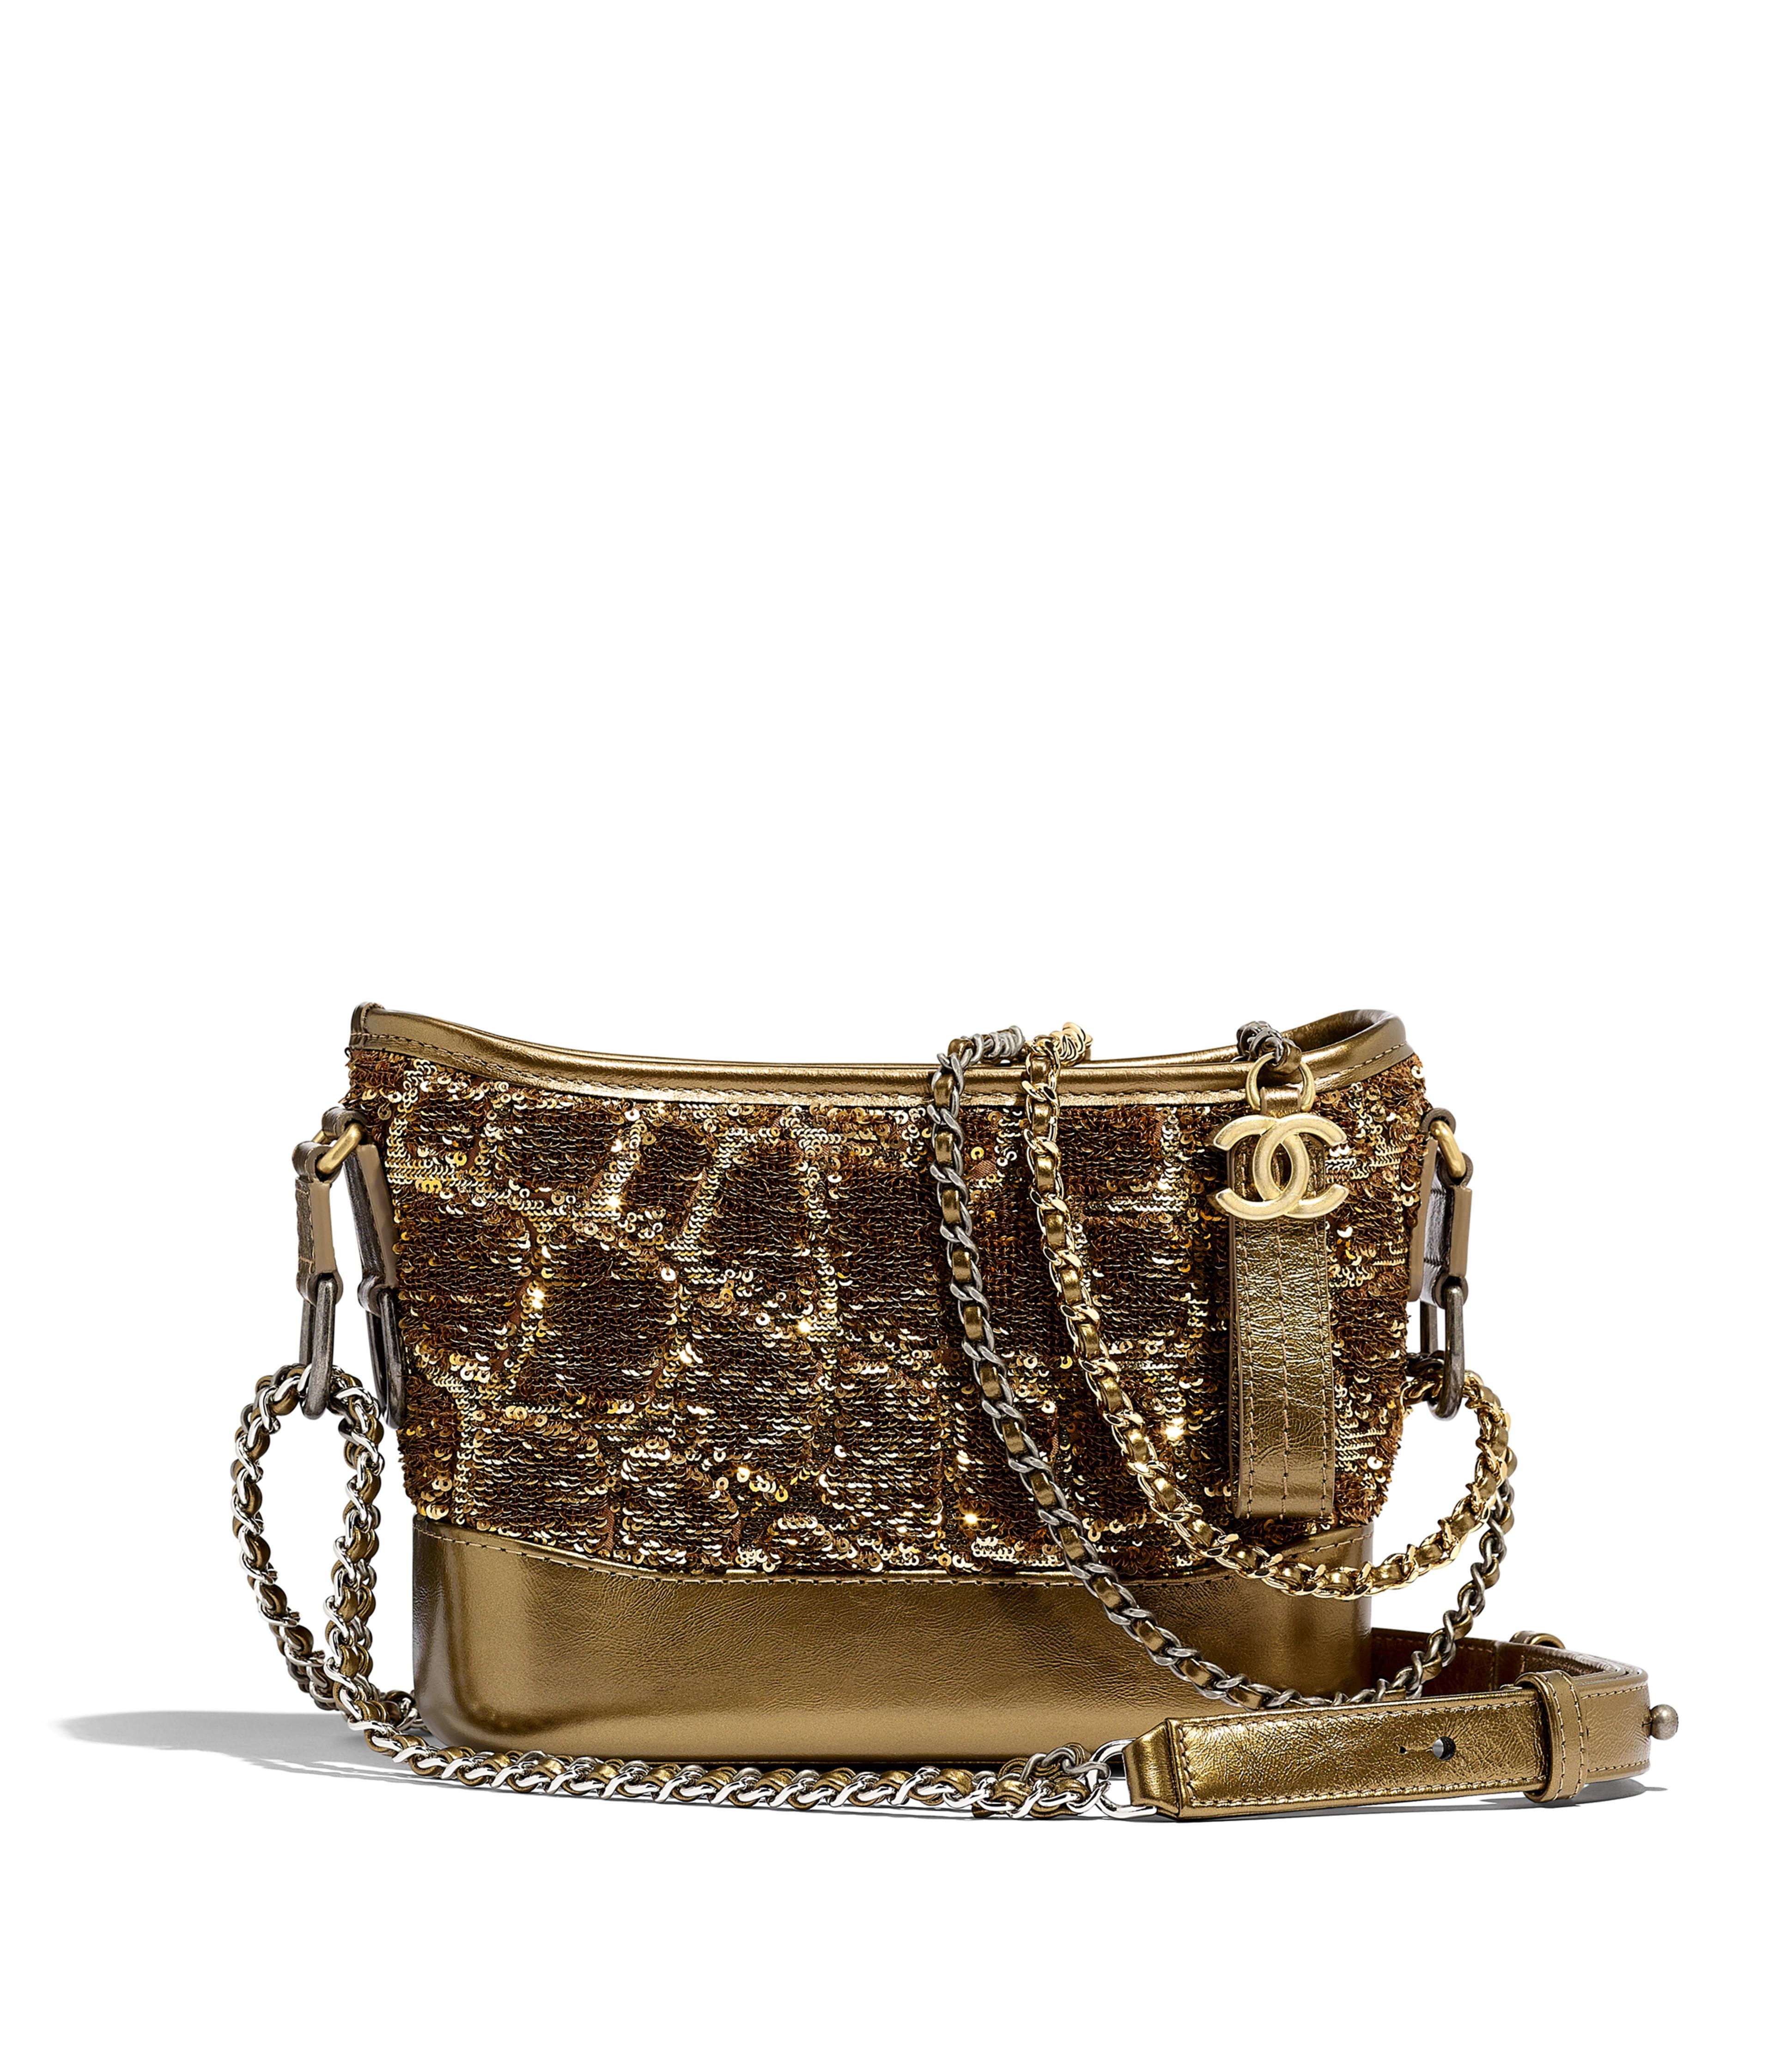 d3ecbe1c42 CHANEL'S GABRIELLE Small Hobo Bag Sequins, Calfksin, Silver-Tone &  Gold-Tone Metal, Gold & Copper Ref. A91810B00883N4739